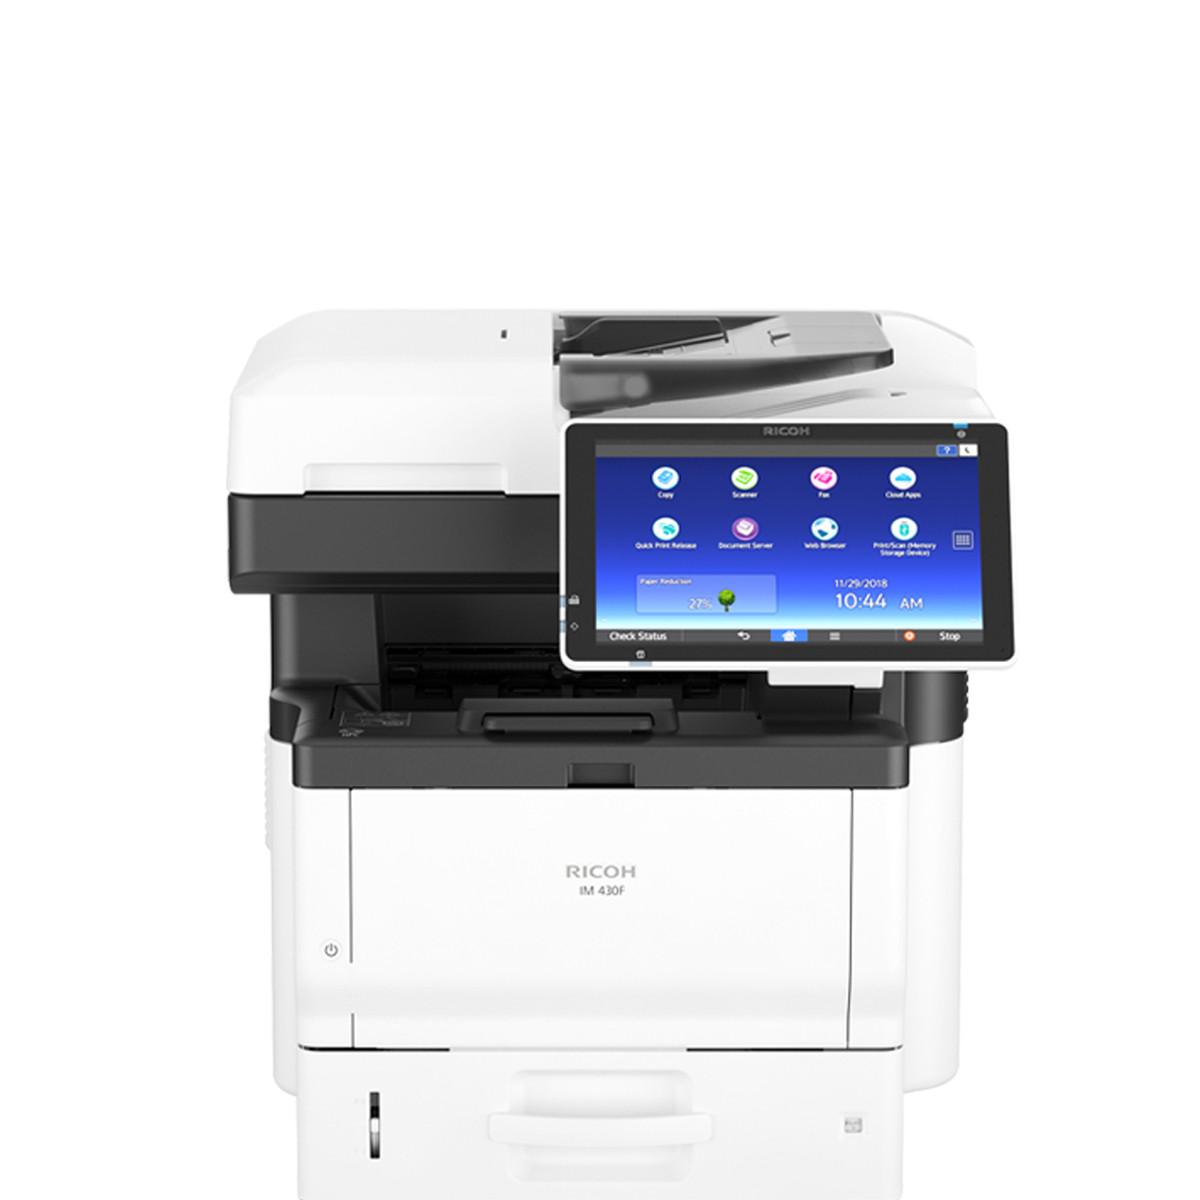 Impressora Ricoh IM 430F | Multifuncional Laser Monocromática